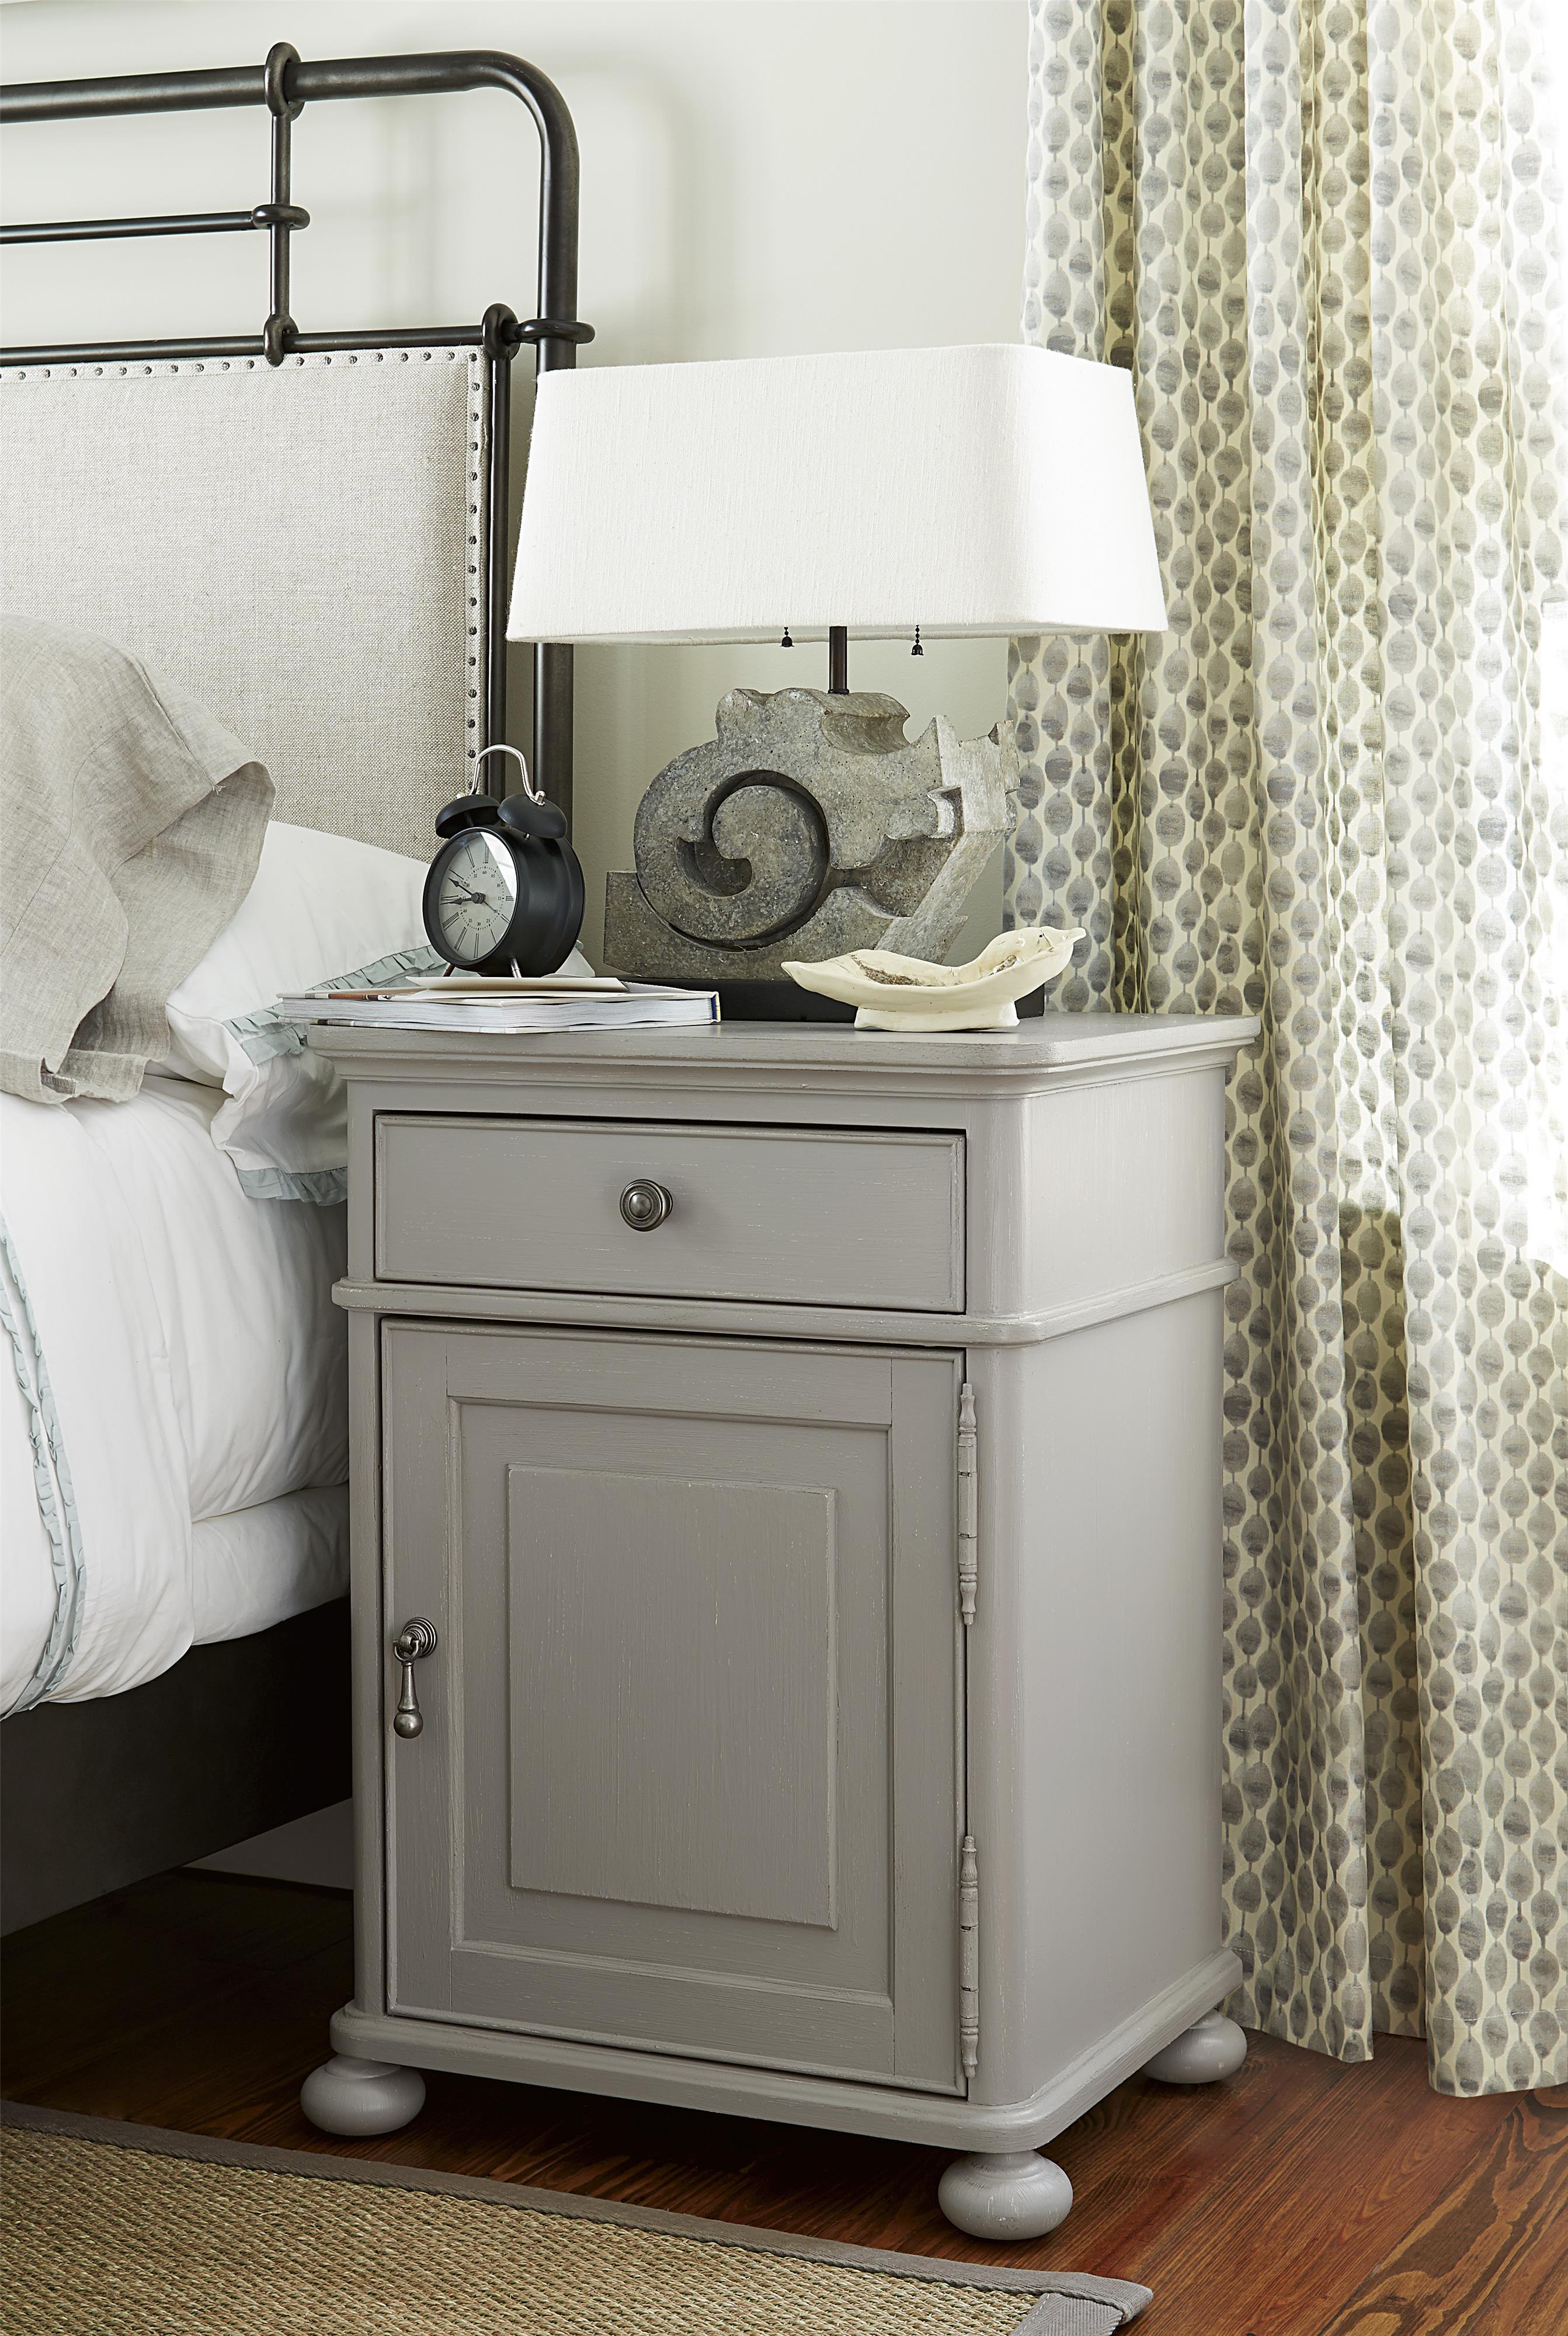 Paula Deen By Universal Dogwood Door Nightstand With Adjustable Shelf Fashion Furniture